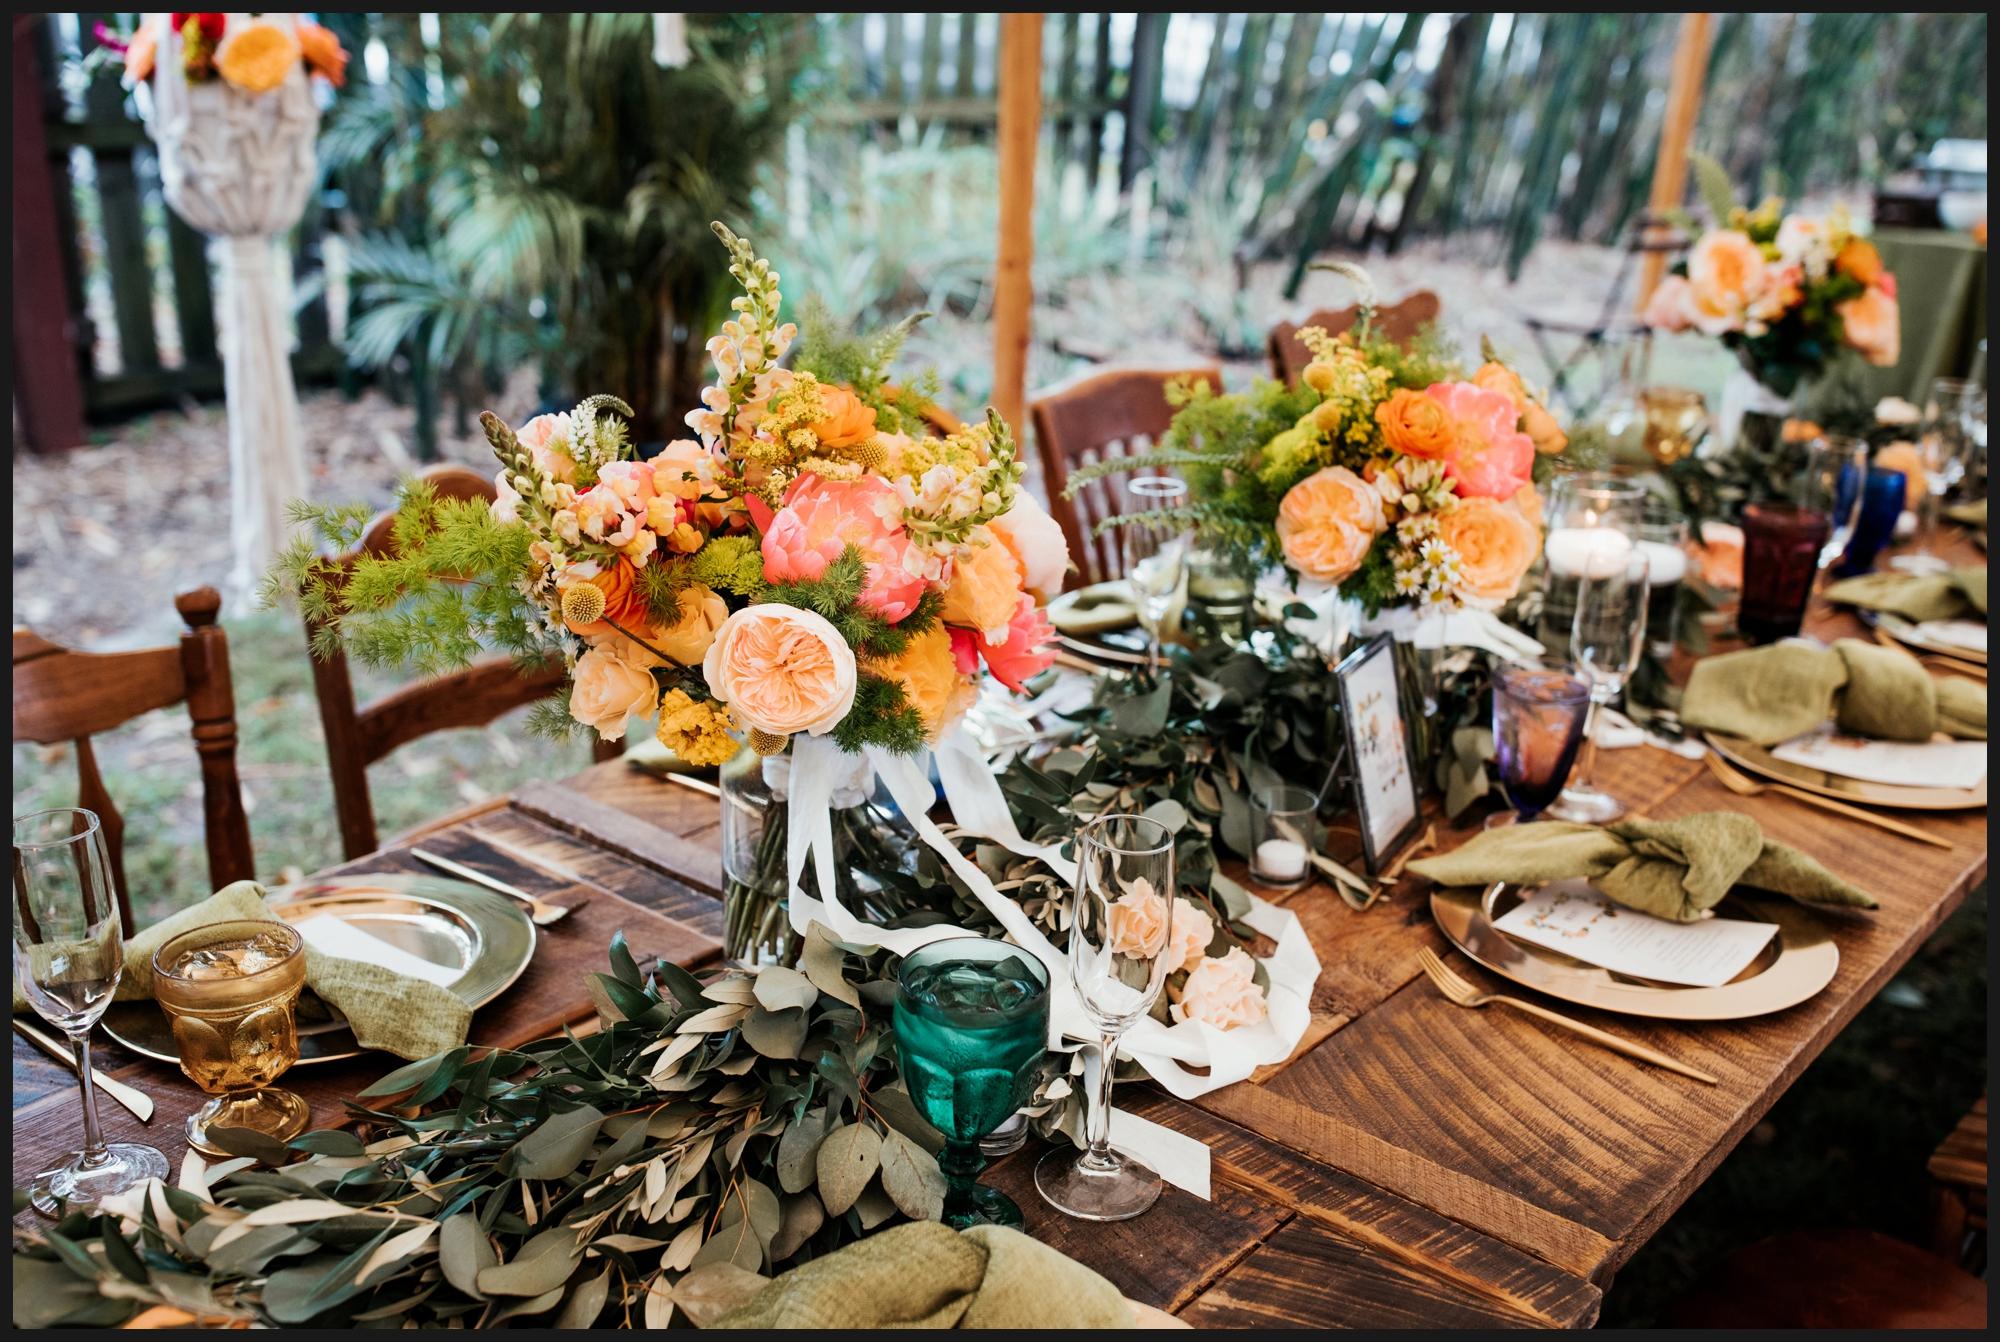 Orlando-Wedding-Photographer-destination-wedding-photographer-florida-wedding-photographer-bohemian-wedding-photographer_2023.jpg